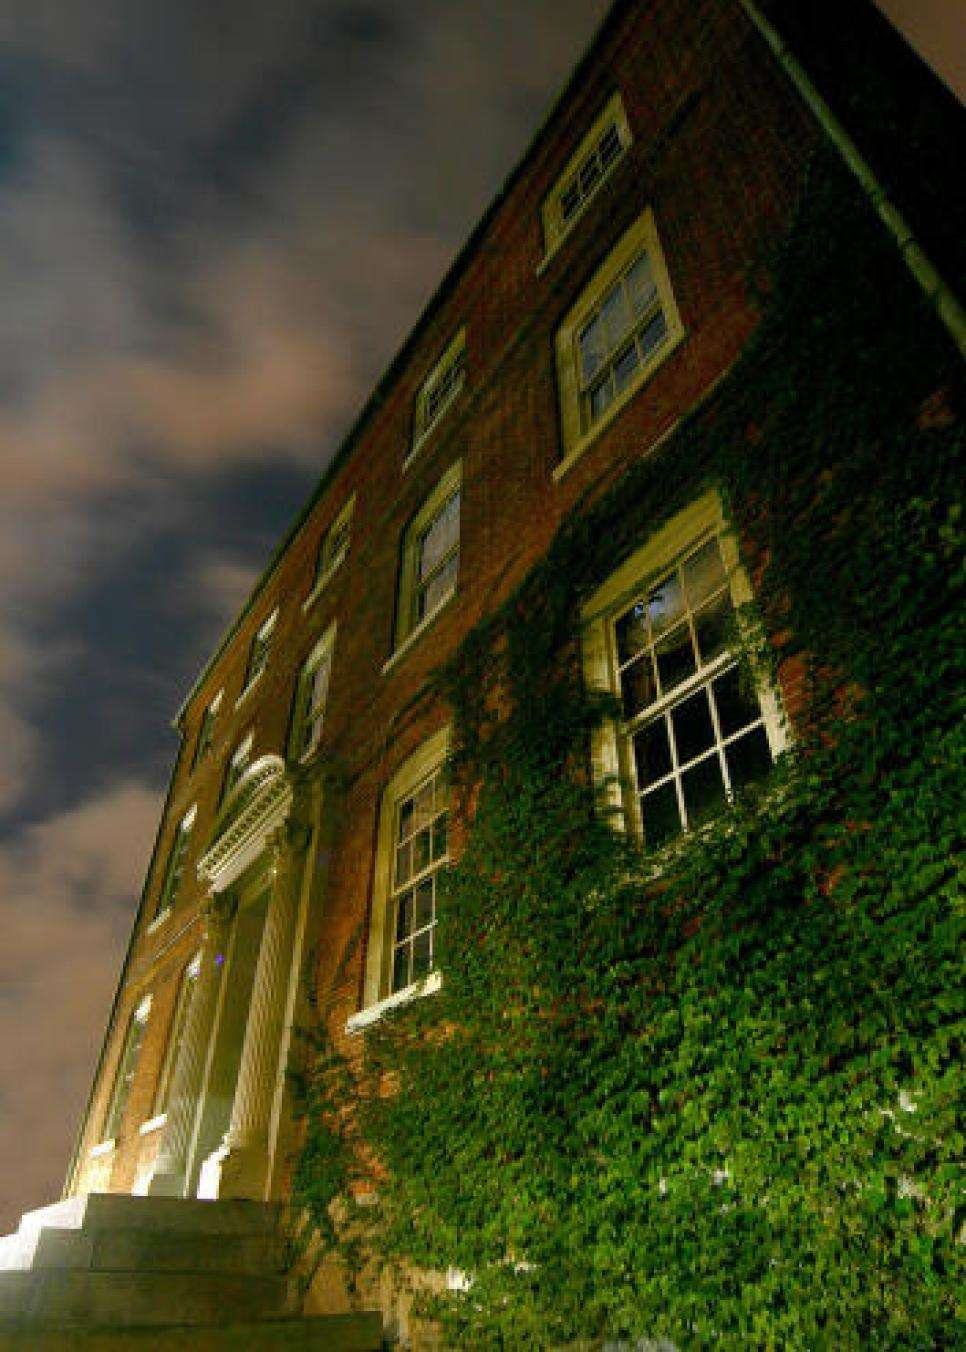 Massechusetts The Joshua Ward House - Haunted Mansions